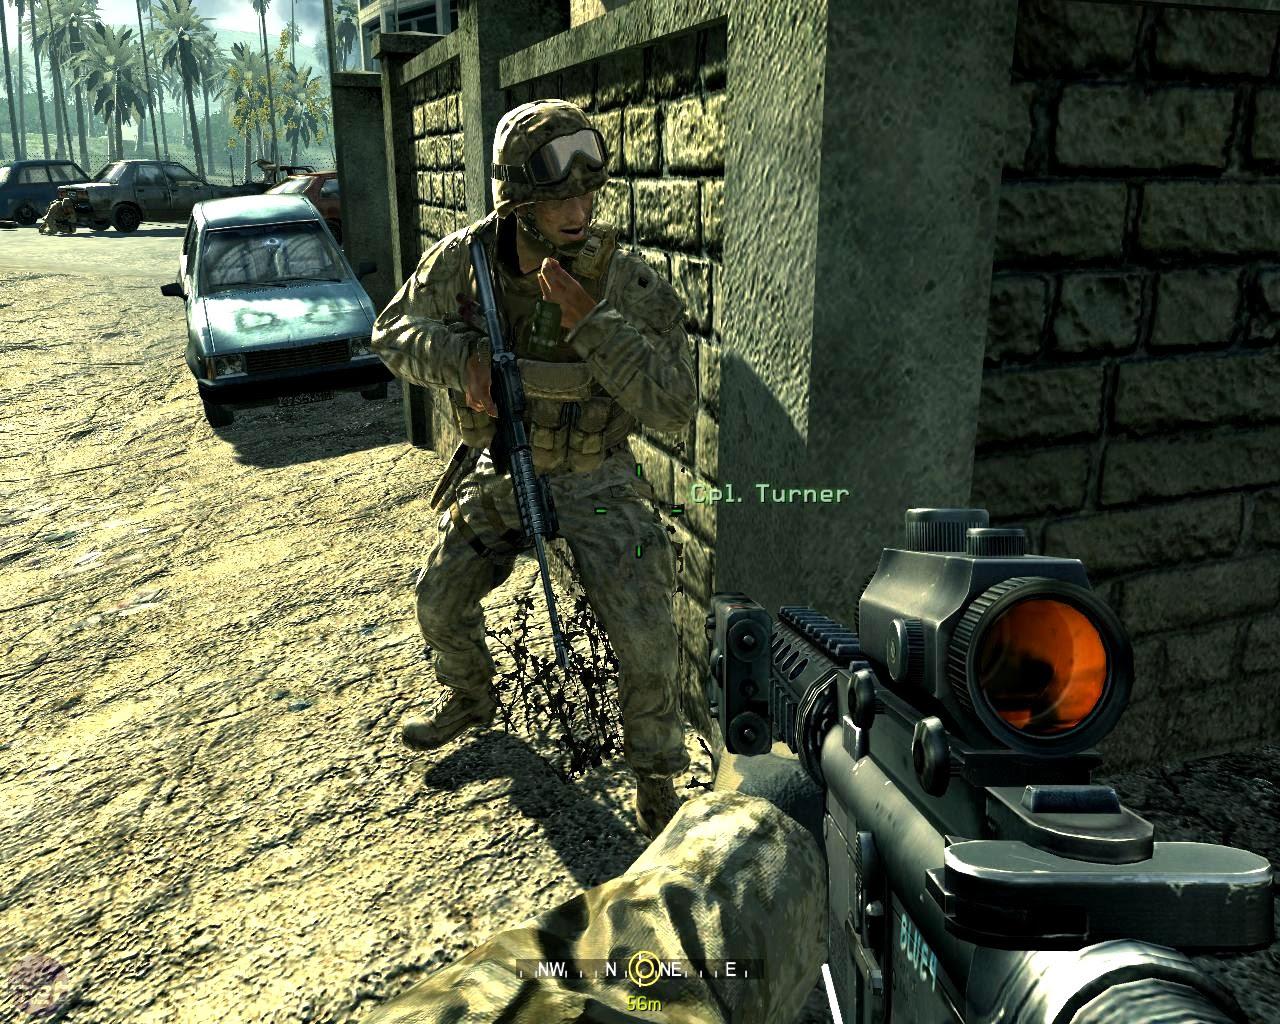 Call Of Duty 4 Modern Warfare Wallpaper 1280x1024 67326